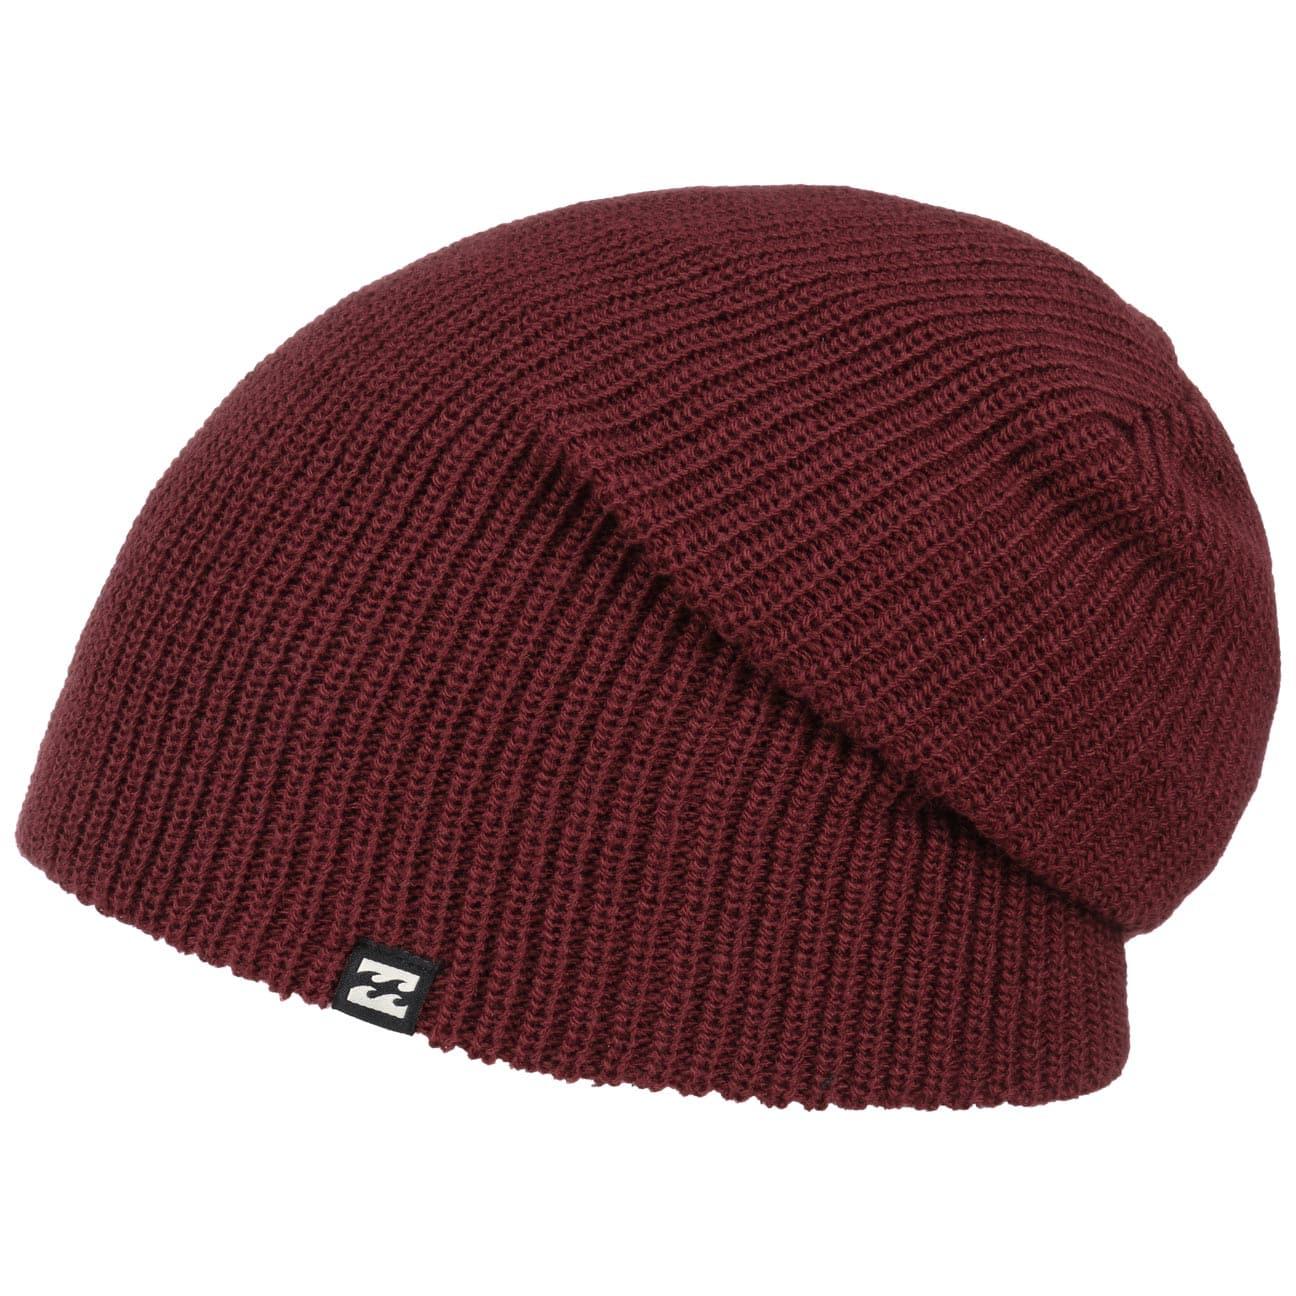 Bonnet Beanie Livingstone by Billabong  bonnet de grande taille